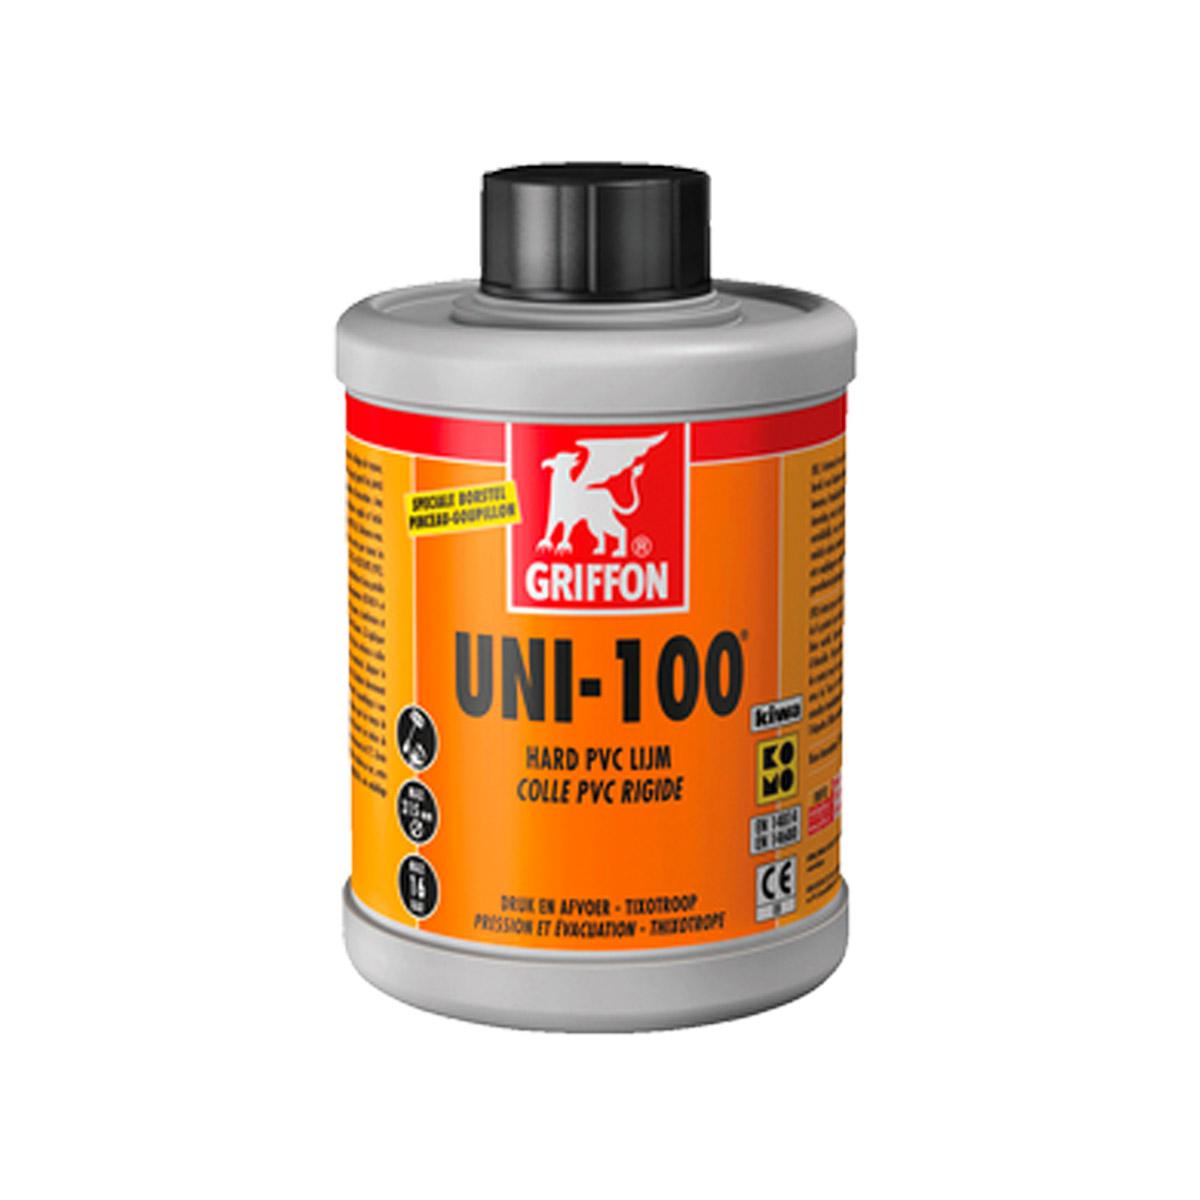 Klebstoff GRIFFON UNI-100, 125 ML TUBE Klebstoff GRIFFON UNI-100, 125 ML TUBE